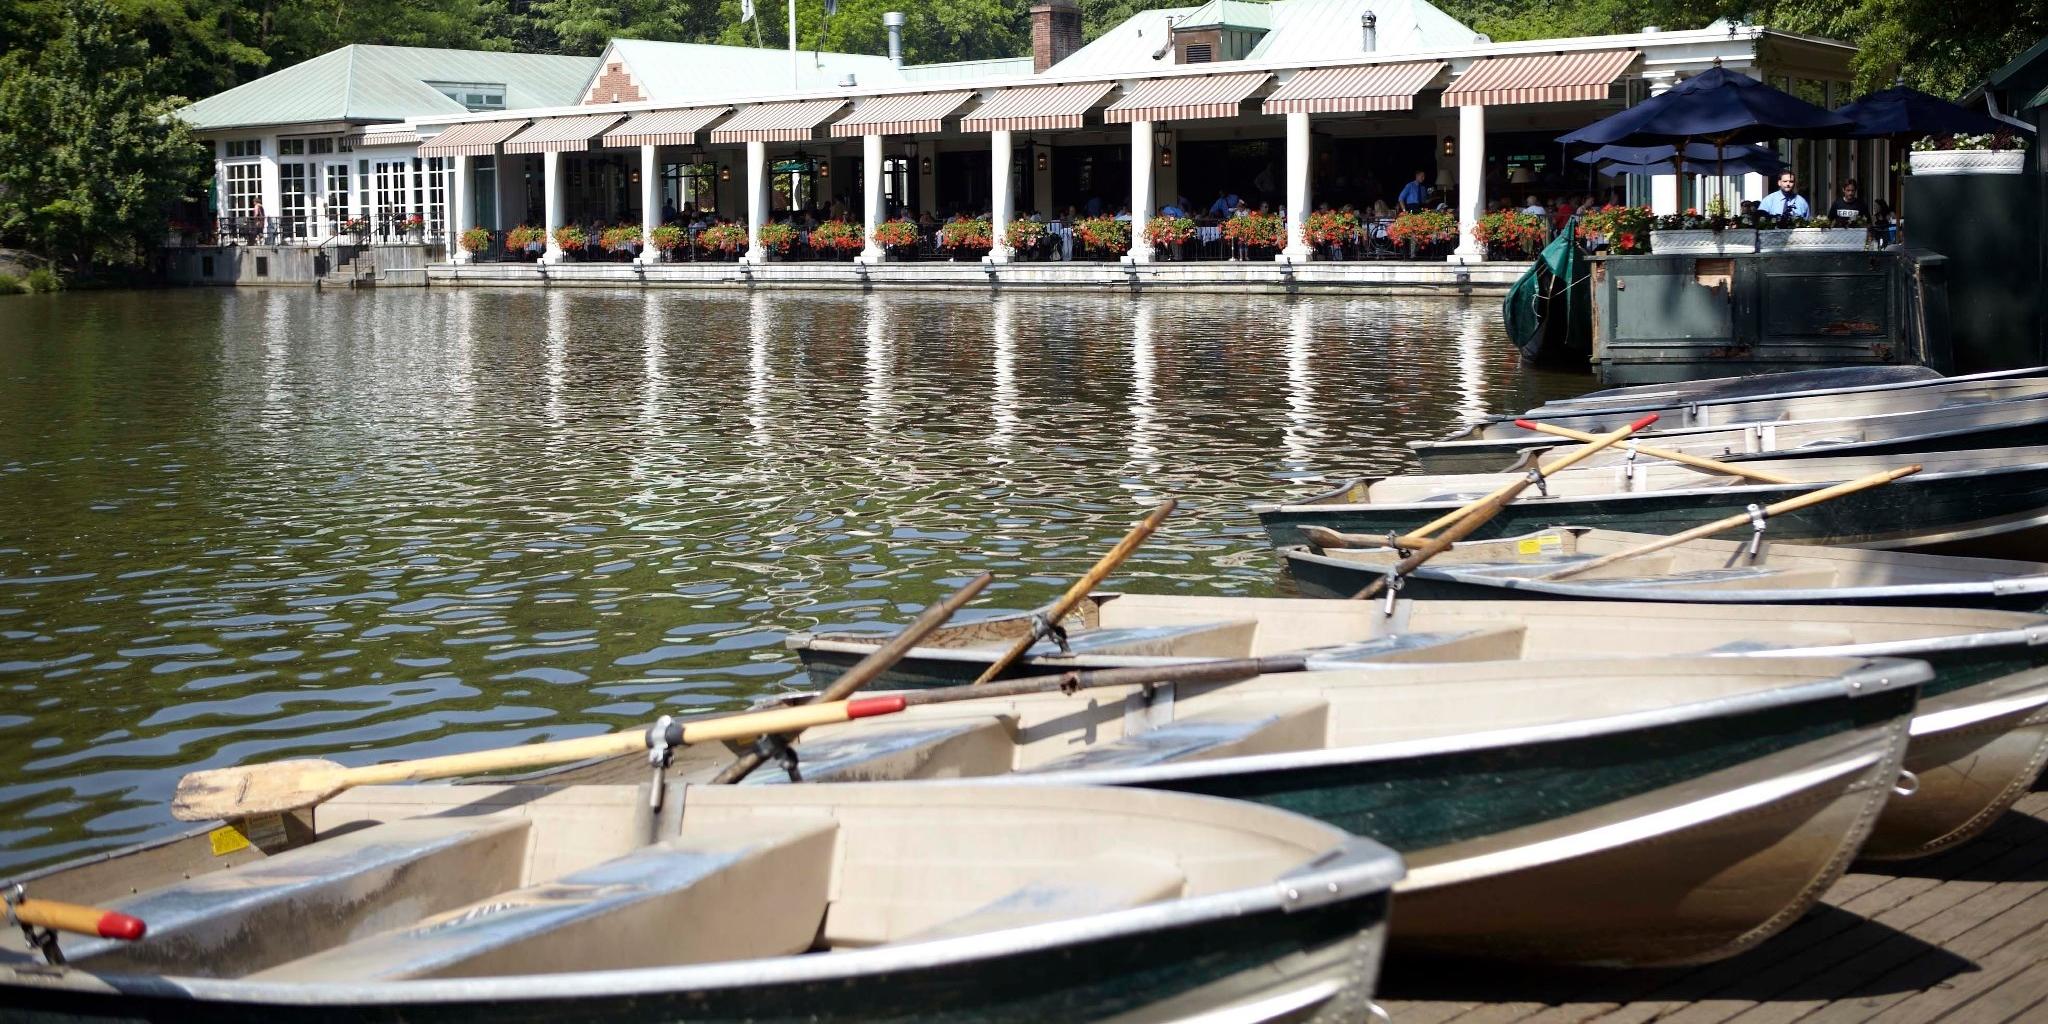 Brunch The Loeb Boathouse (10021 New York)